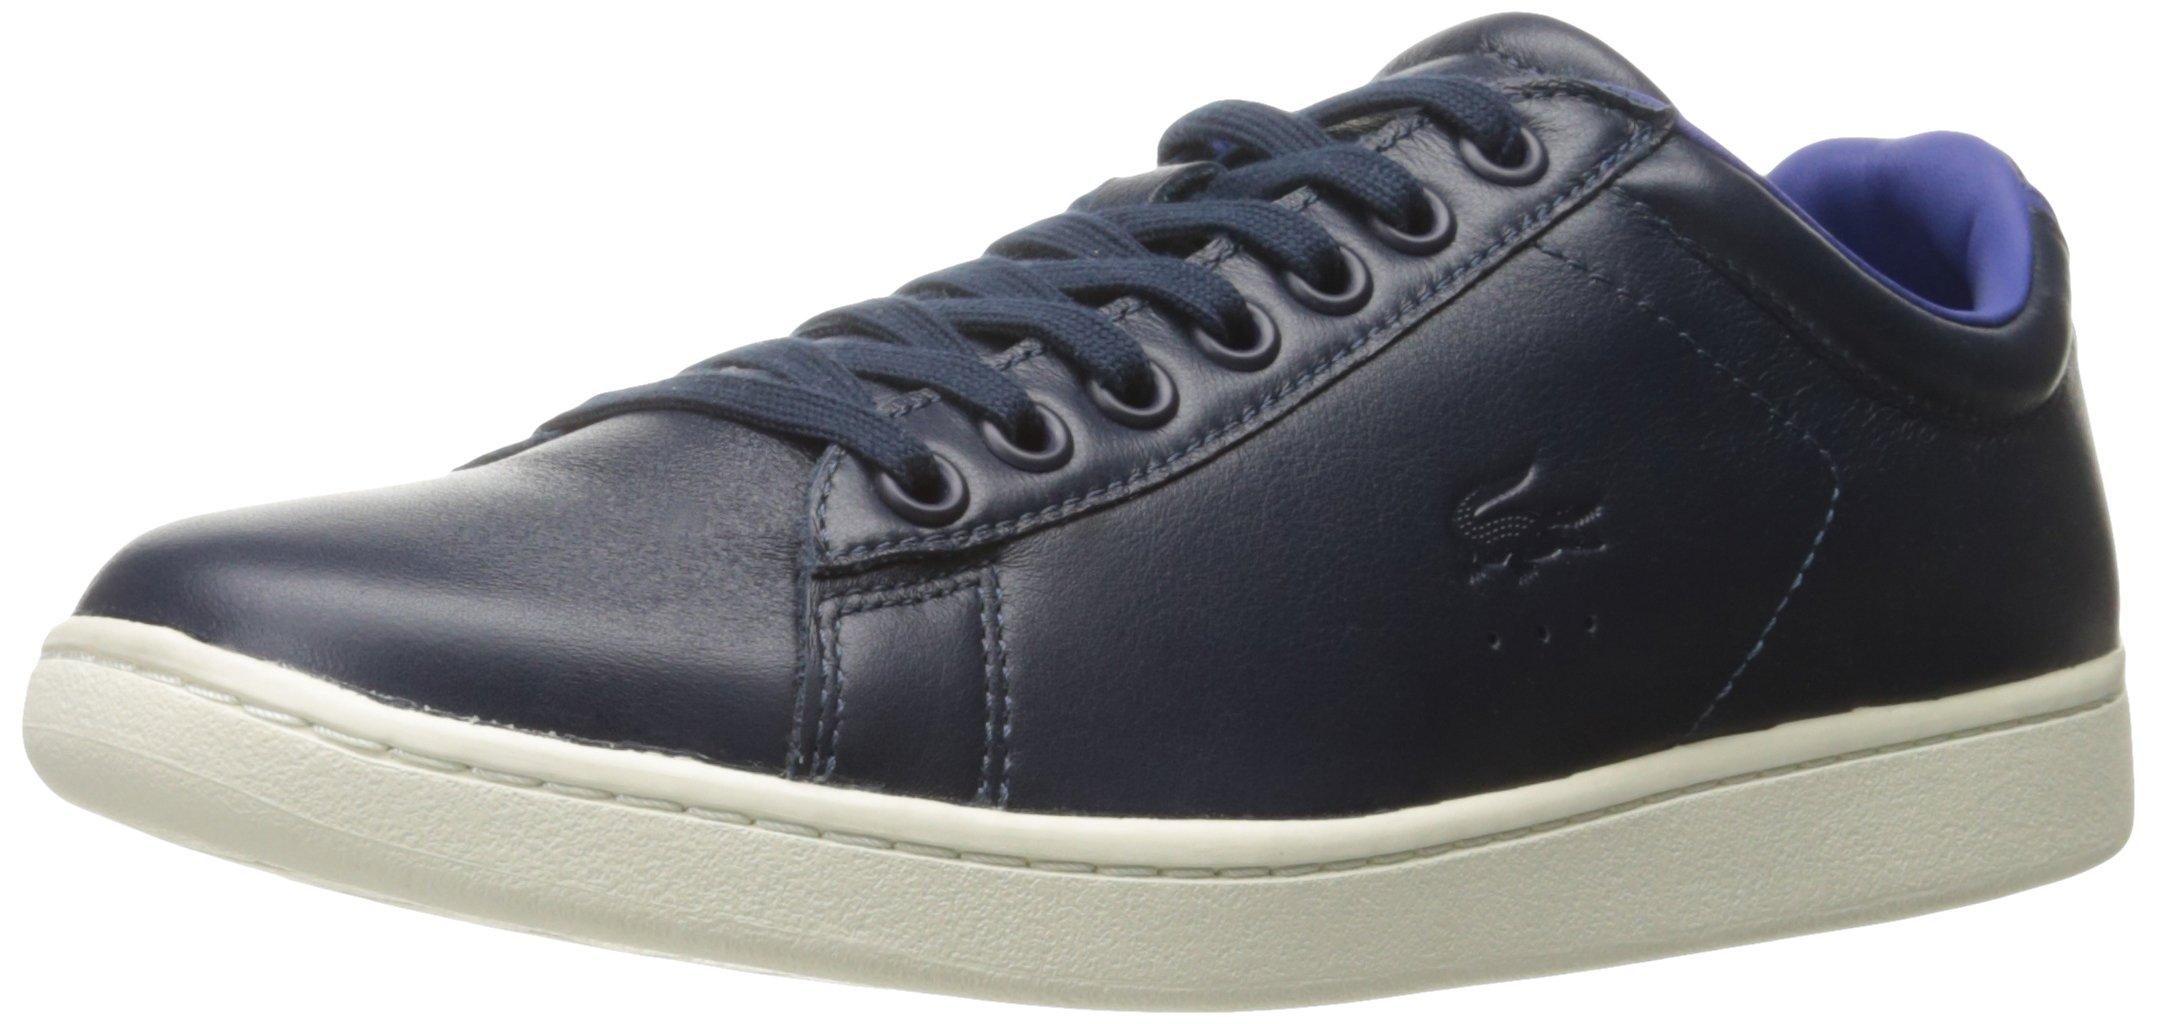 Lacoste Men's Carnaby Evo 316 1 Cam Fashion Sneaker, Navy, 9 M US